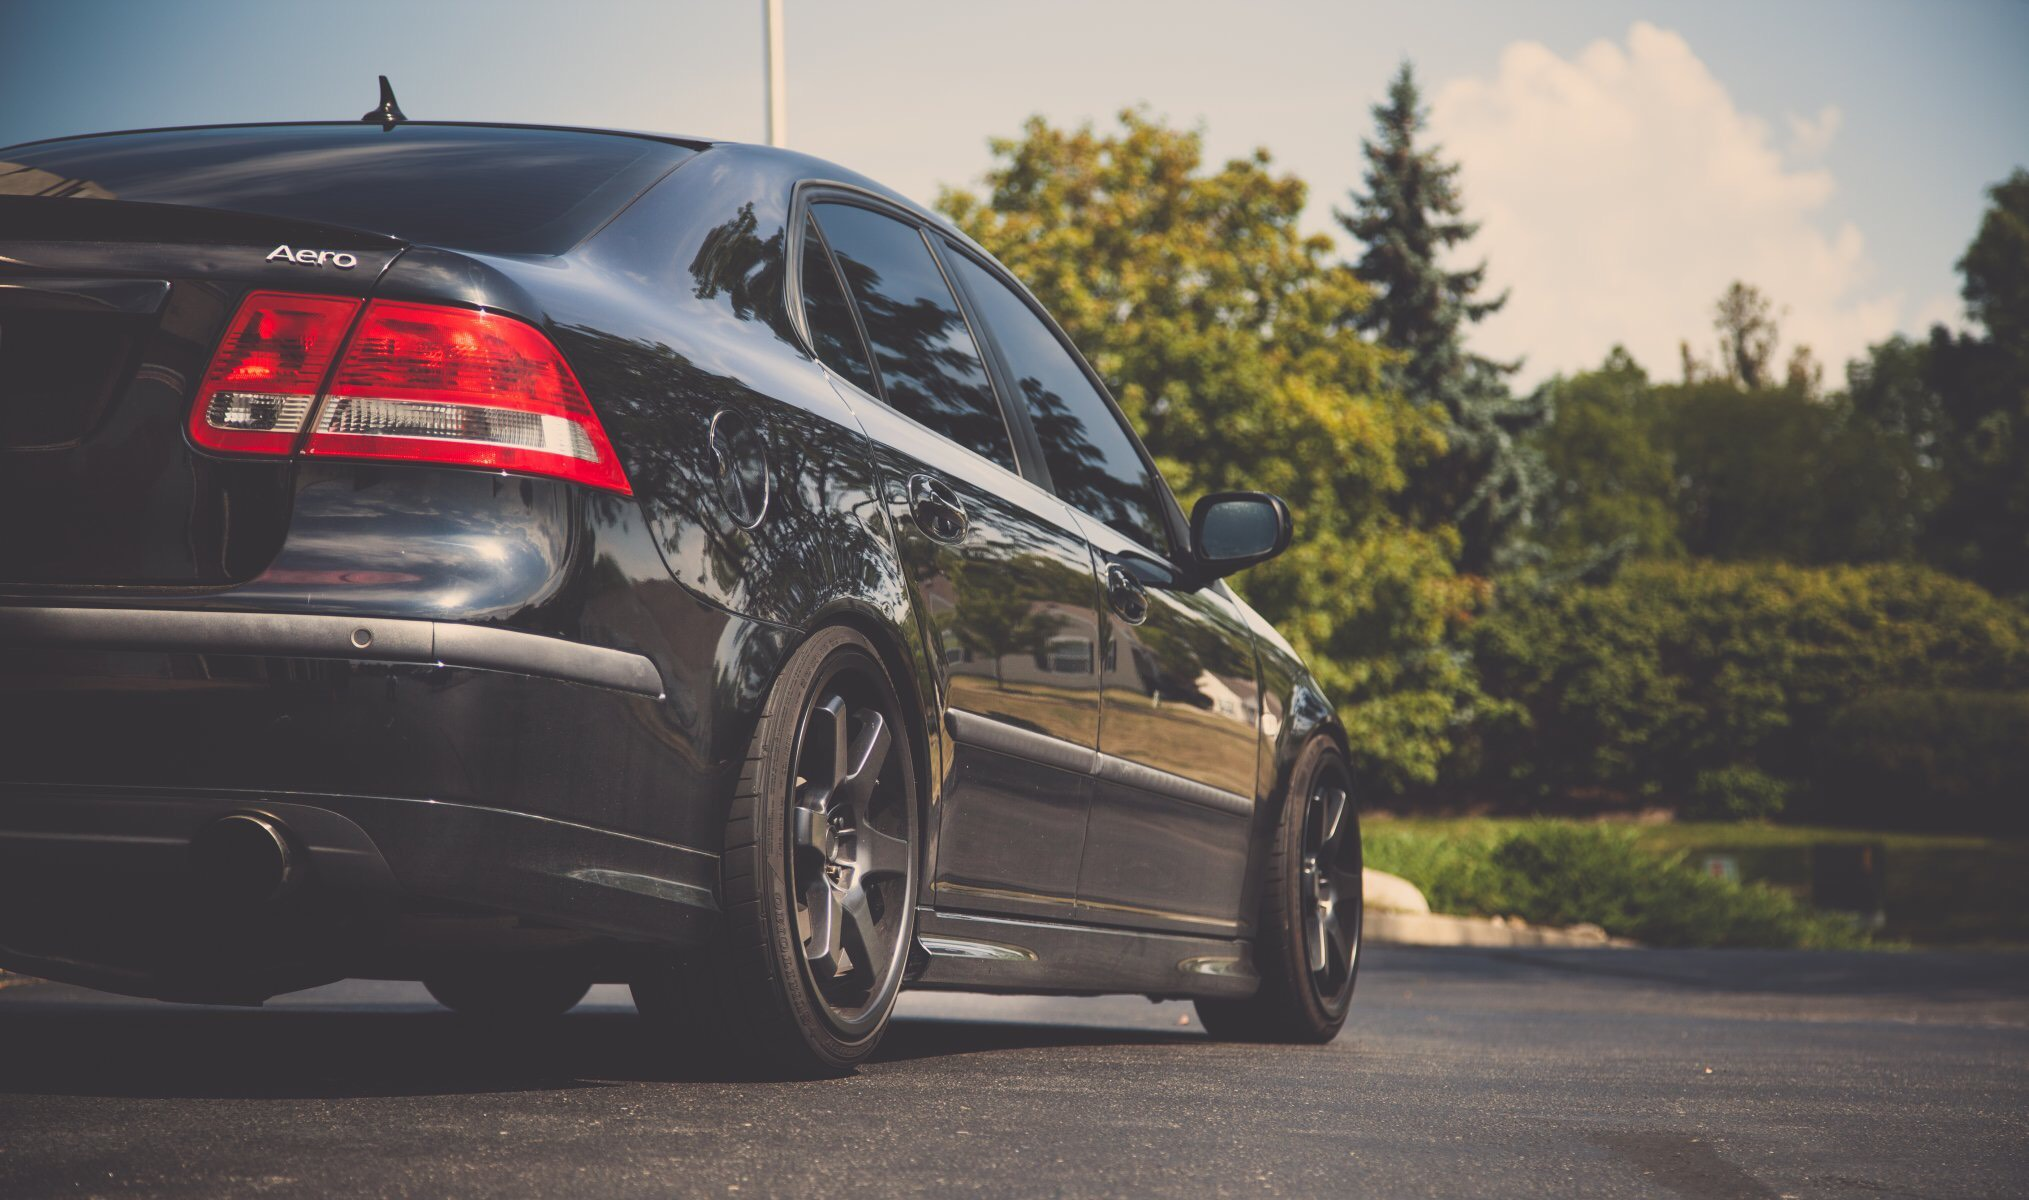 Latest Lexus Car >> Saab 9-3 Wallpaper